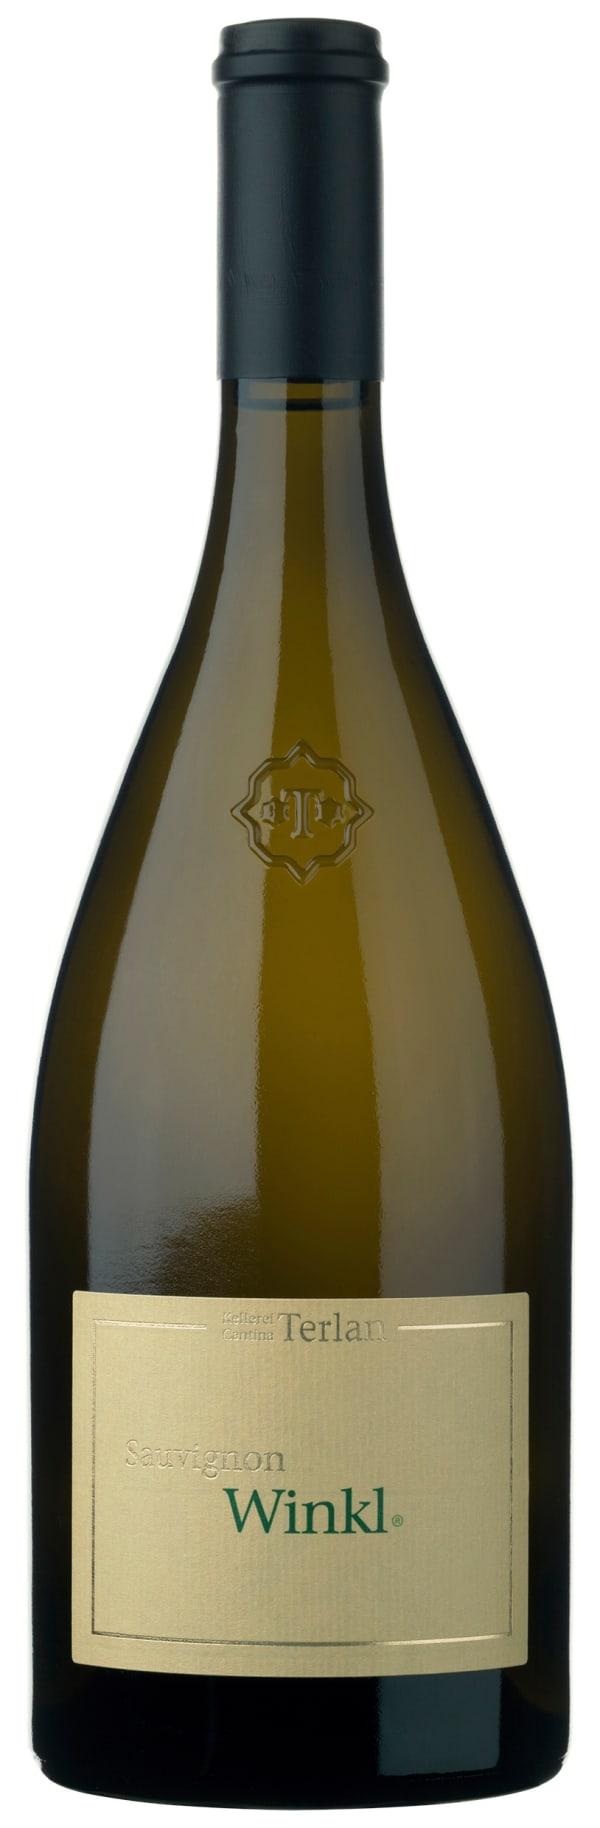 Terlano Winkl Sauvignon Blanc 2019